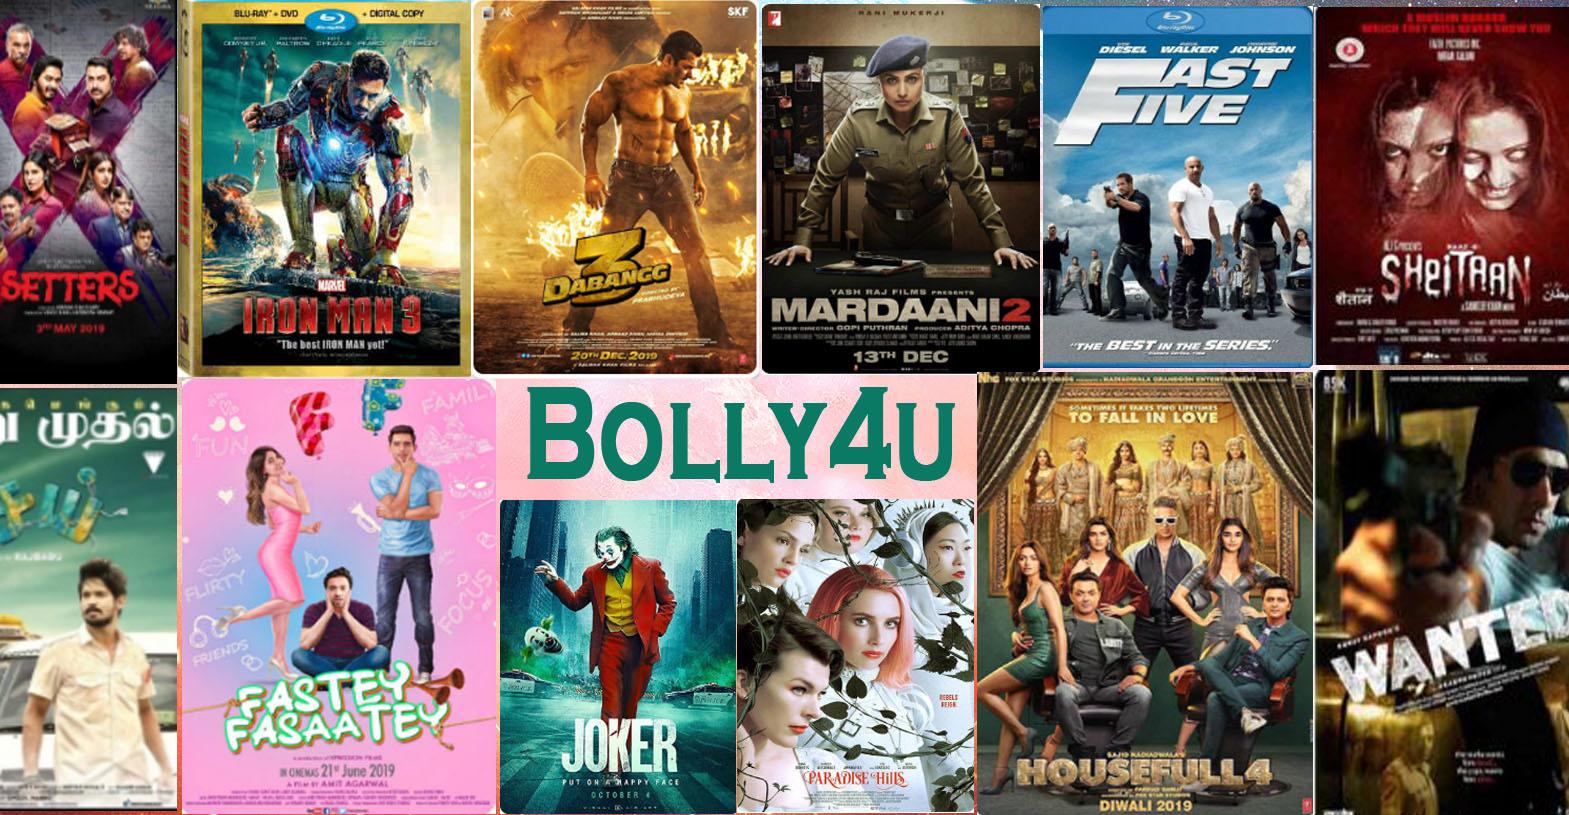 bolly4u-movies